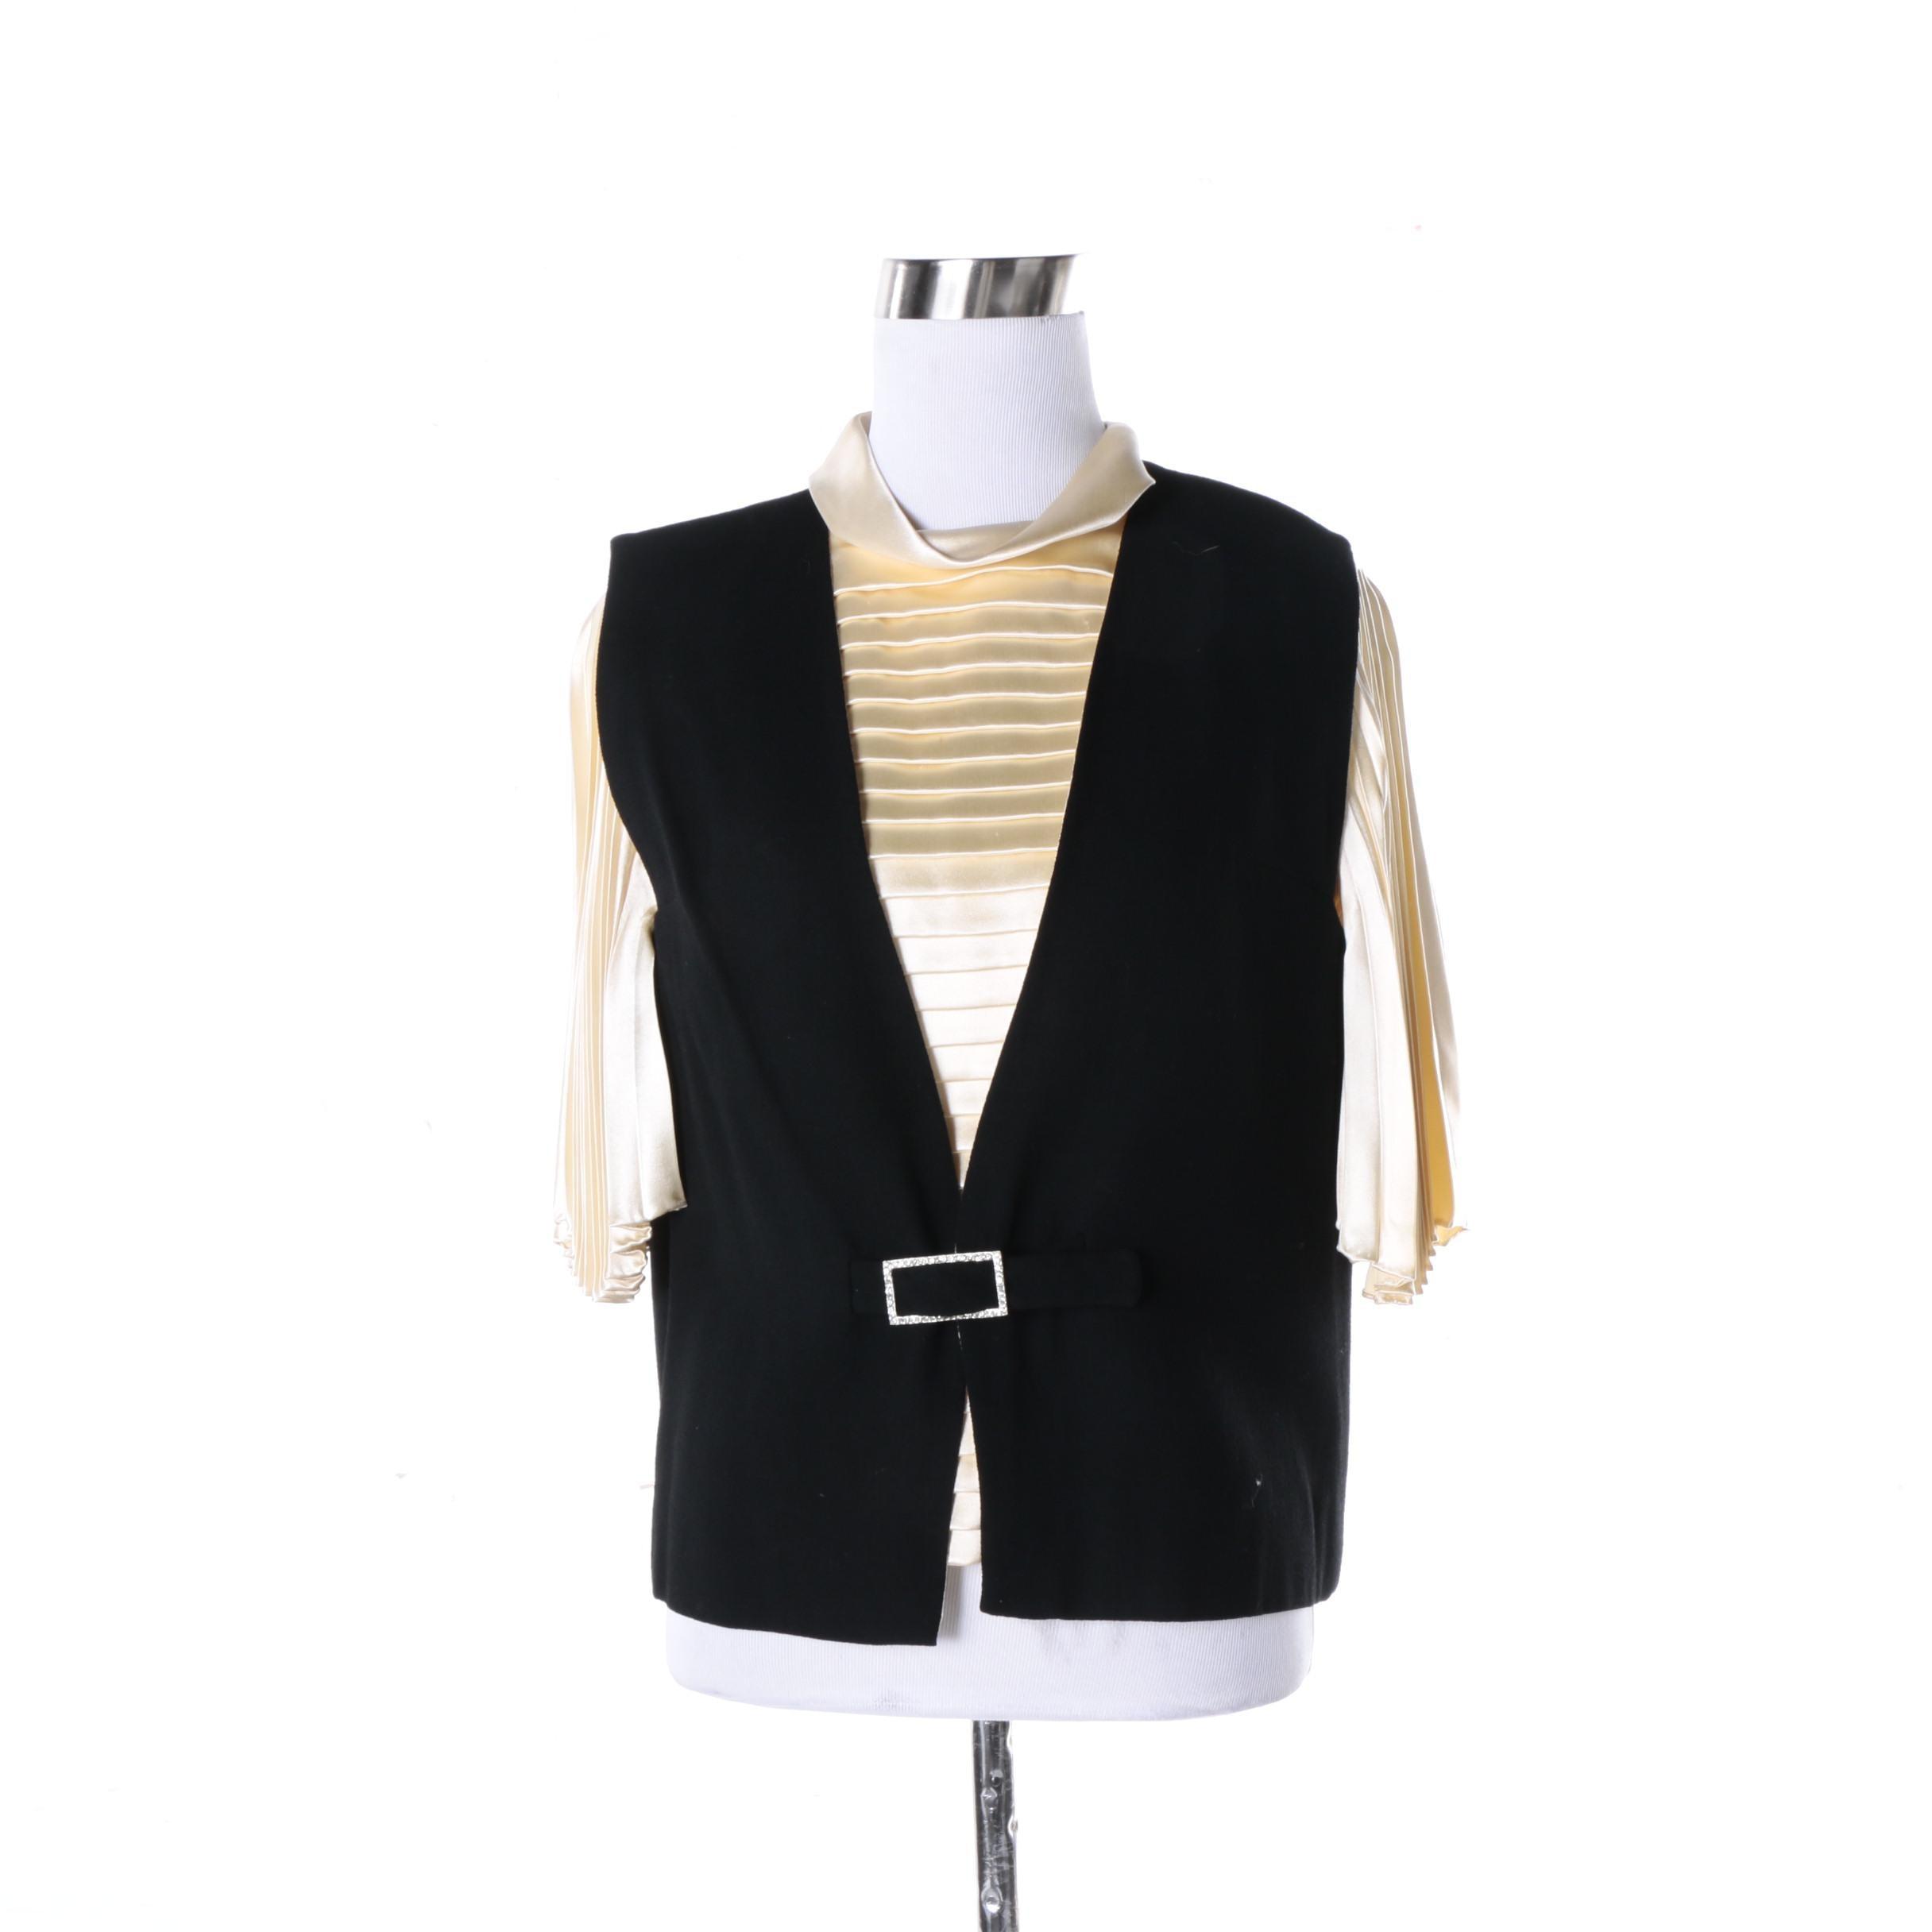 Vintage Cardinali Blouse and Vest